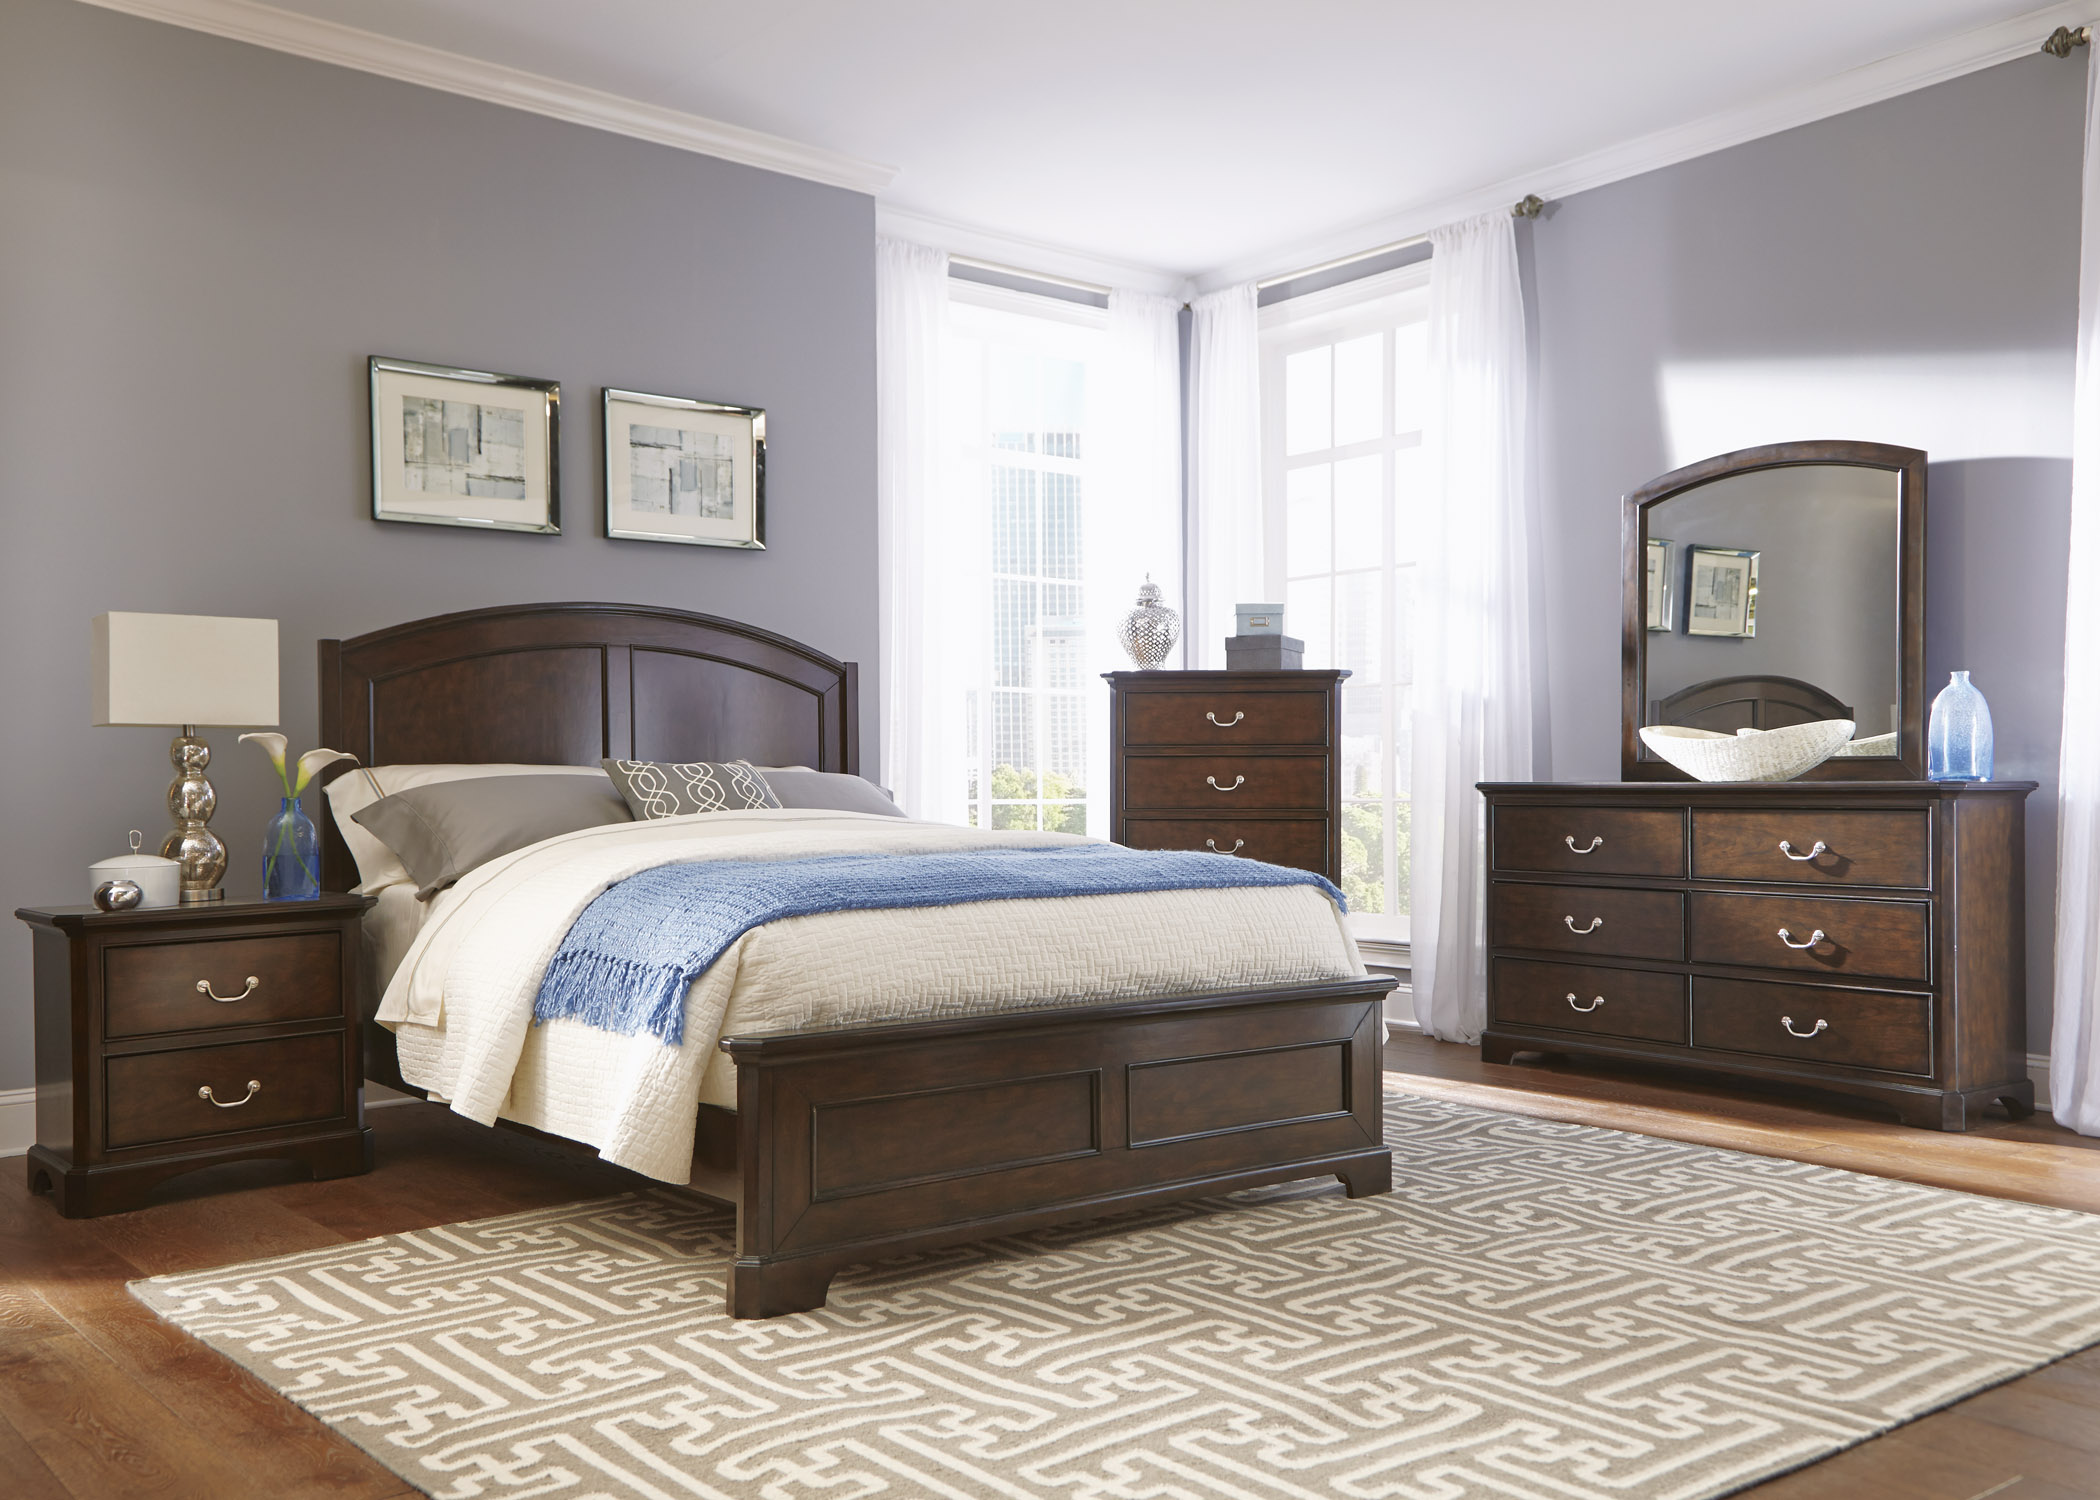 Liberty Furniture Avington King Bedroom Group - Item Number: 172-BR-KPBDMCN